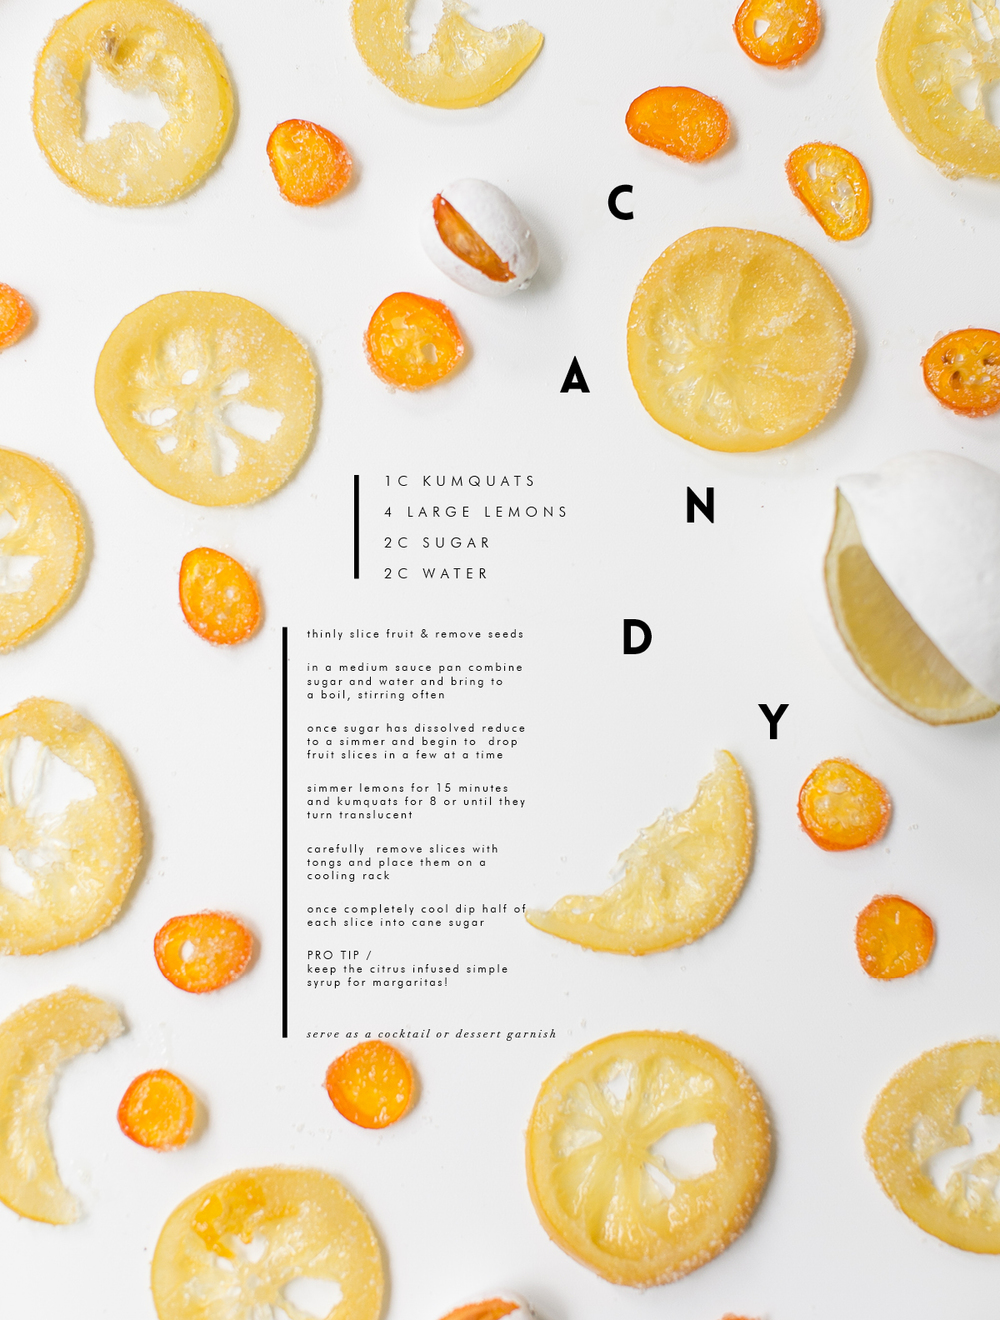 Candied lemon, candied kumquat recipe